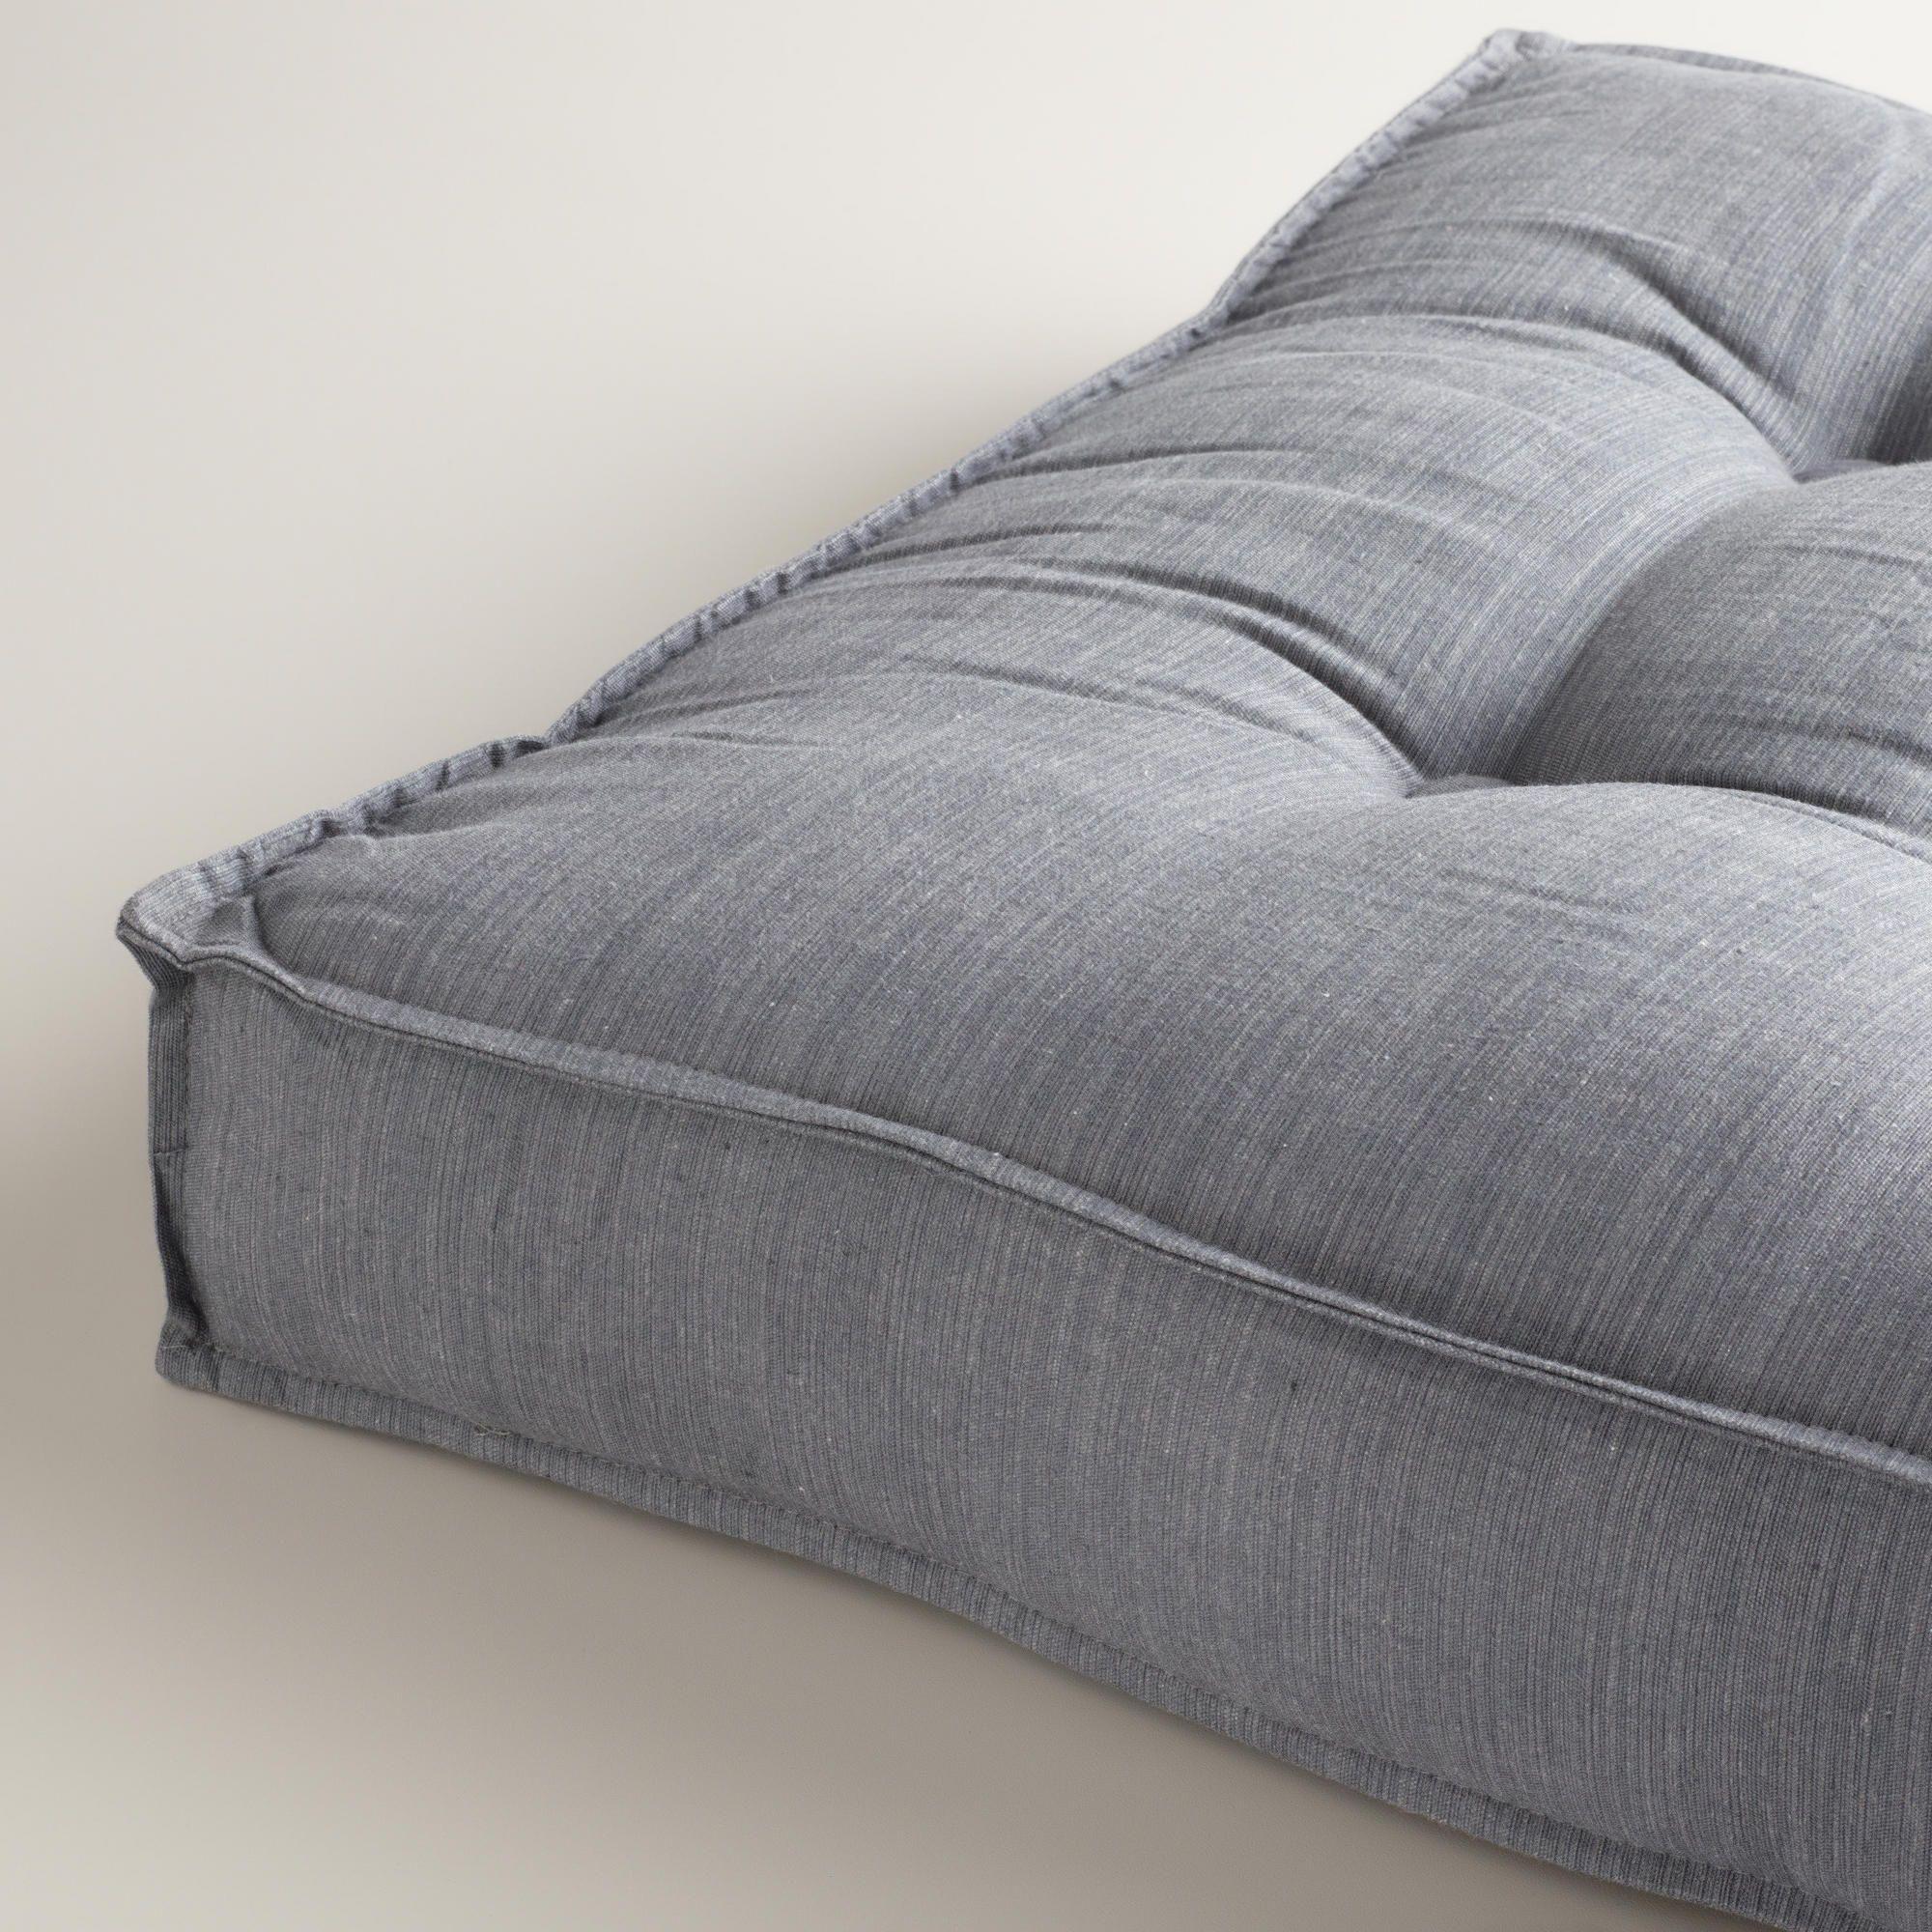 Gray Khadi Tufted Floor Cushion | Gray, Meditation rooms and ...